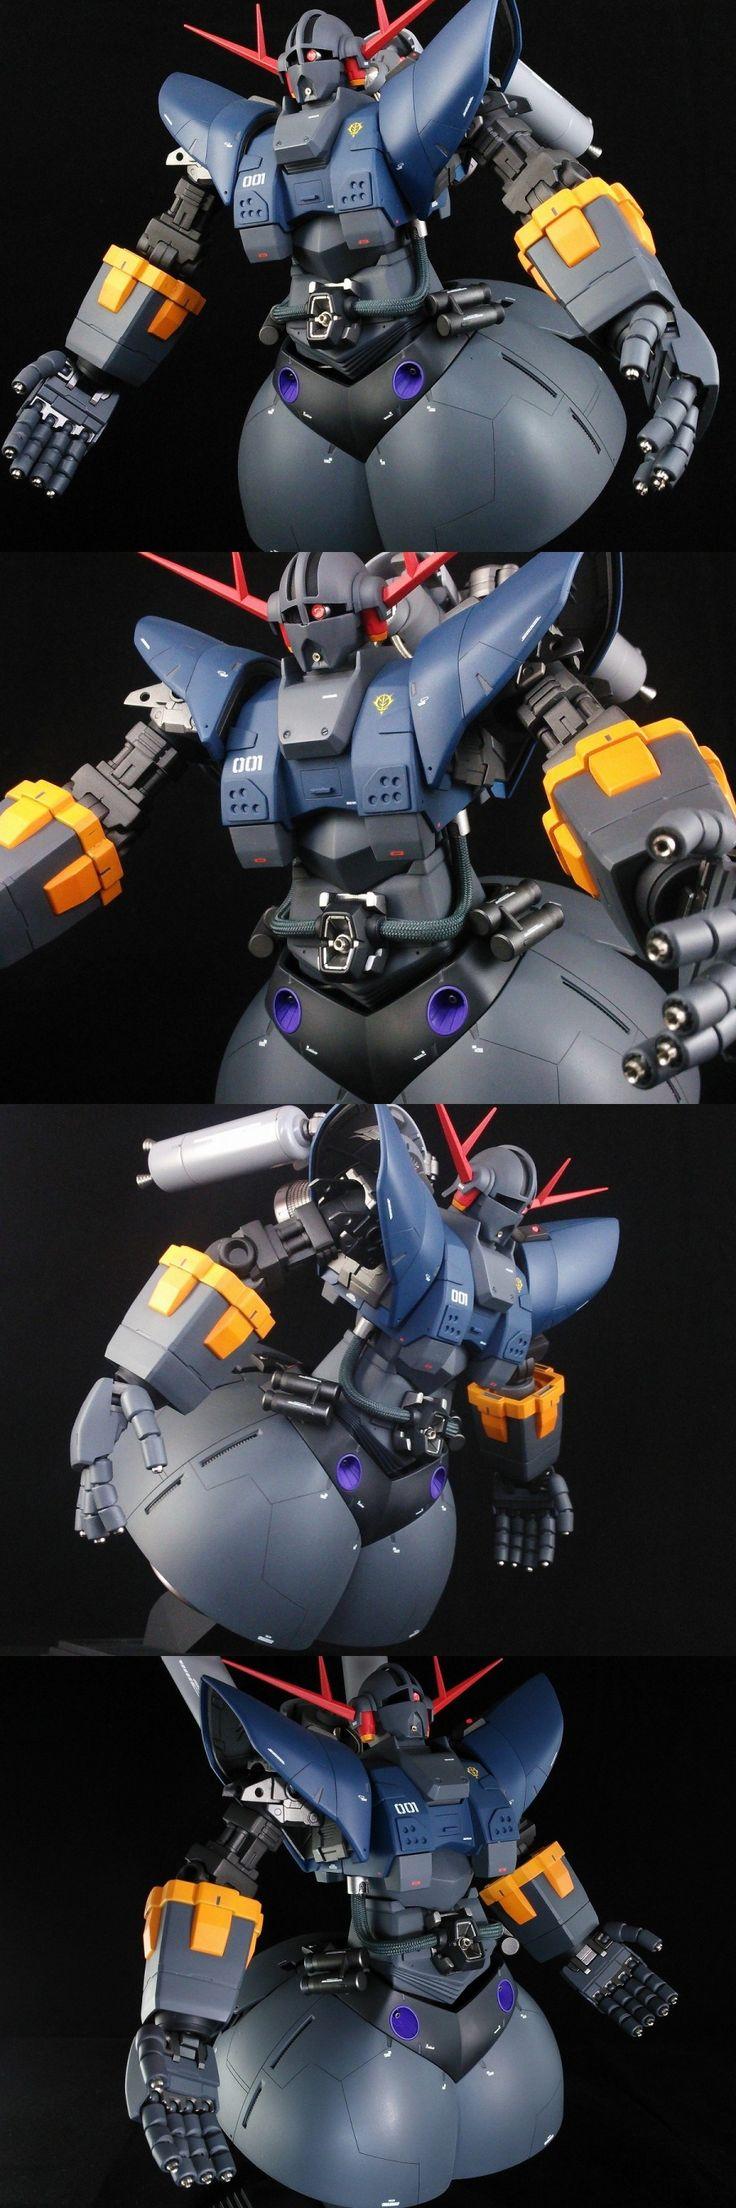 MG/HGUC ZEONG CUSTOM: Work by blue_type_angel. FULL PHOTO REVIEW!   GUNJAP